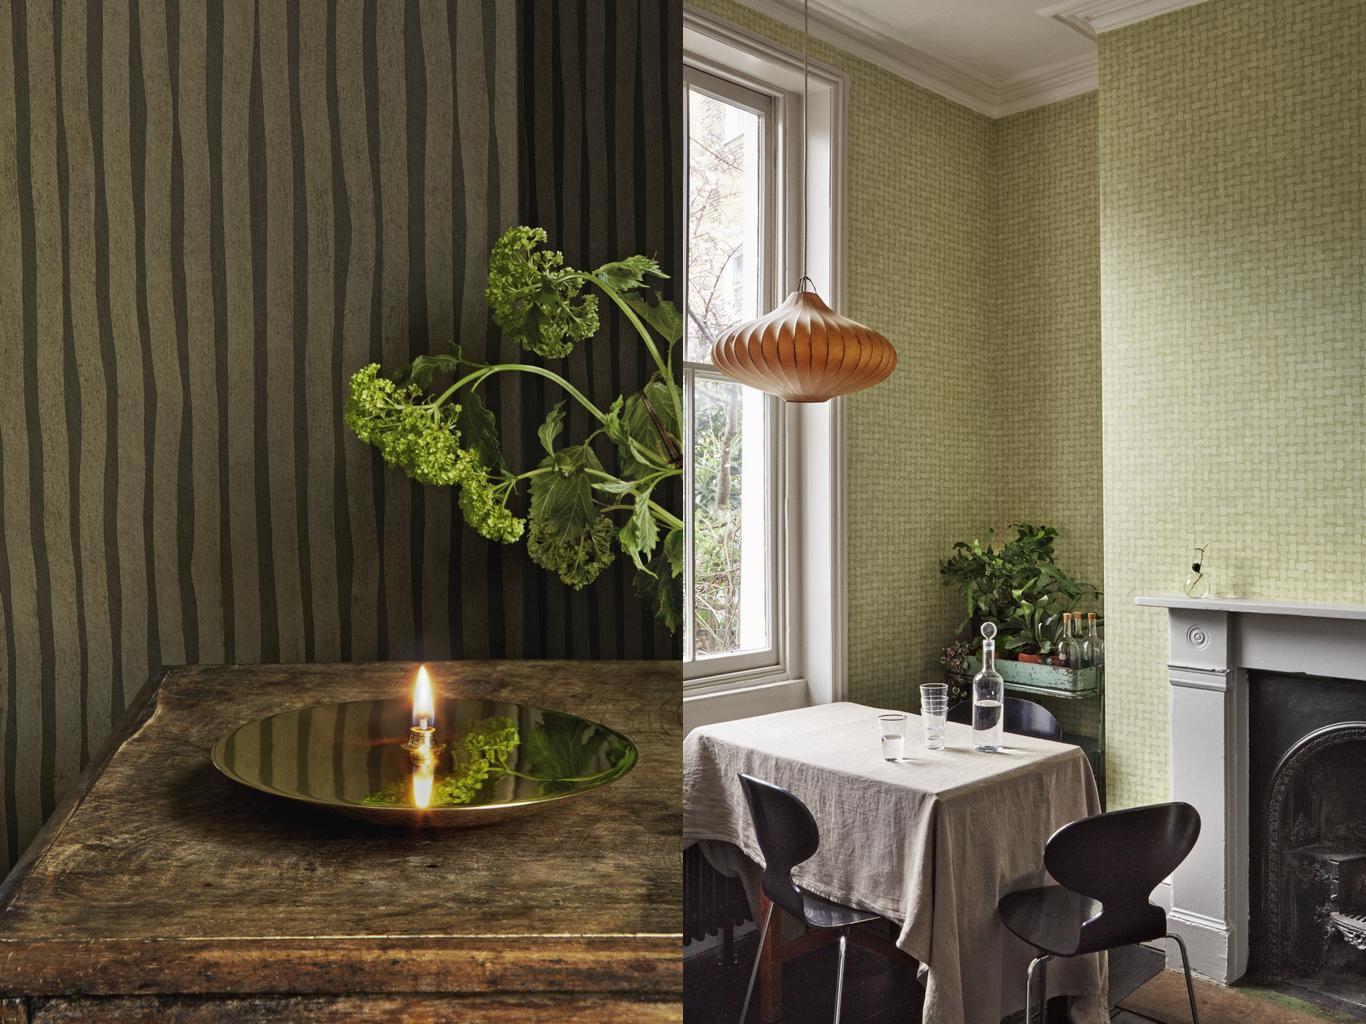 ilse-crawford-swedish-design-in-english-perfomance-3